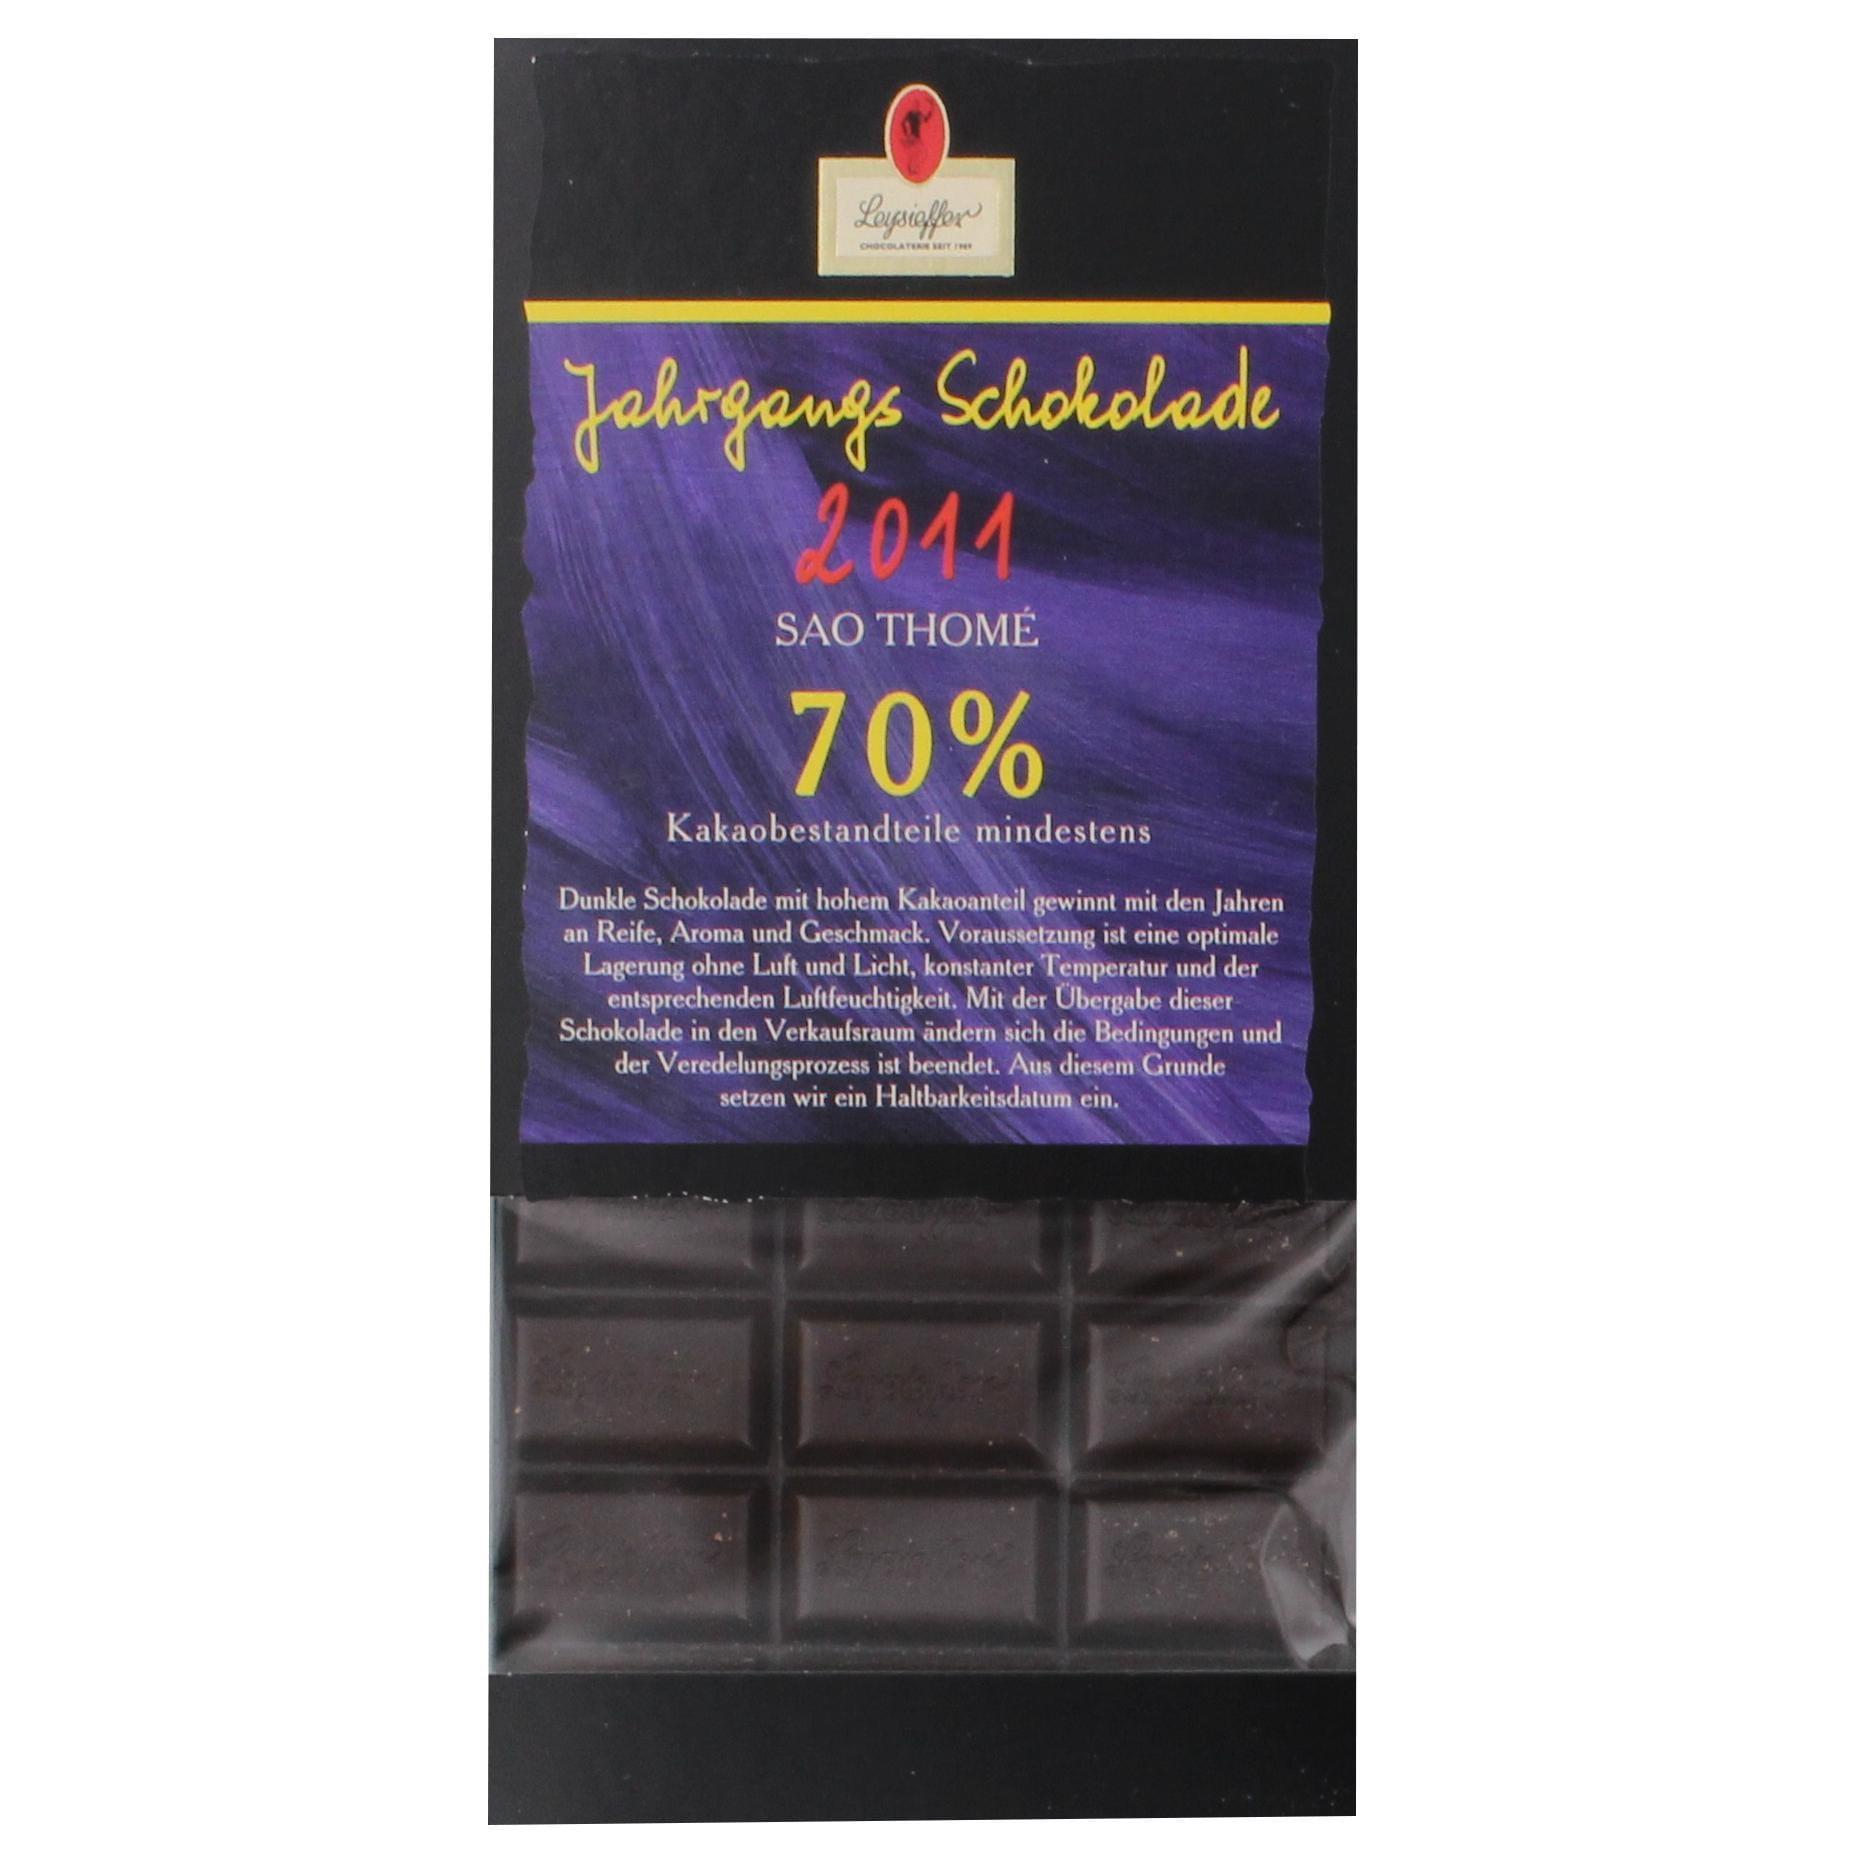 Leysieffer Jahrgangs Schokolade 2015 Sao Tomé 70% 100g